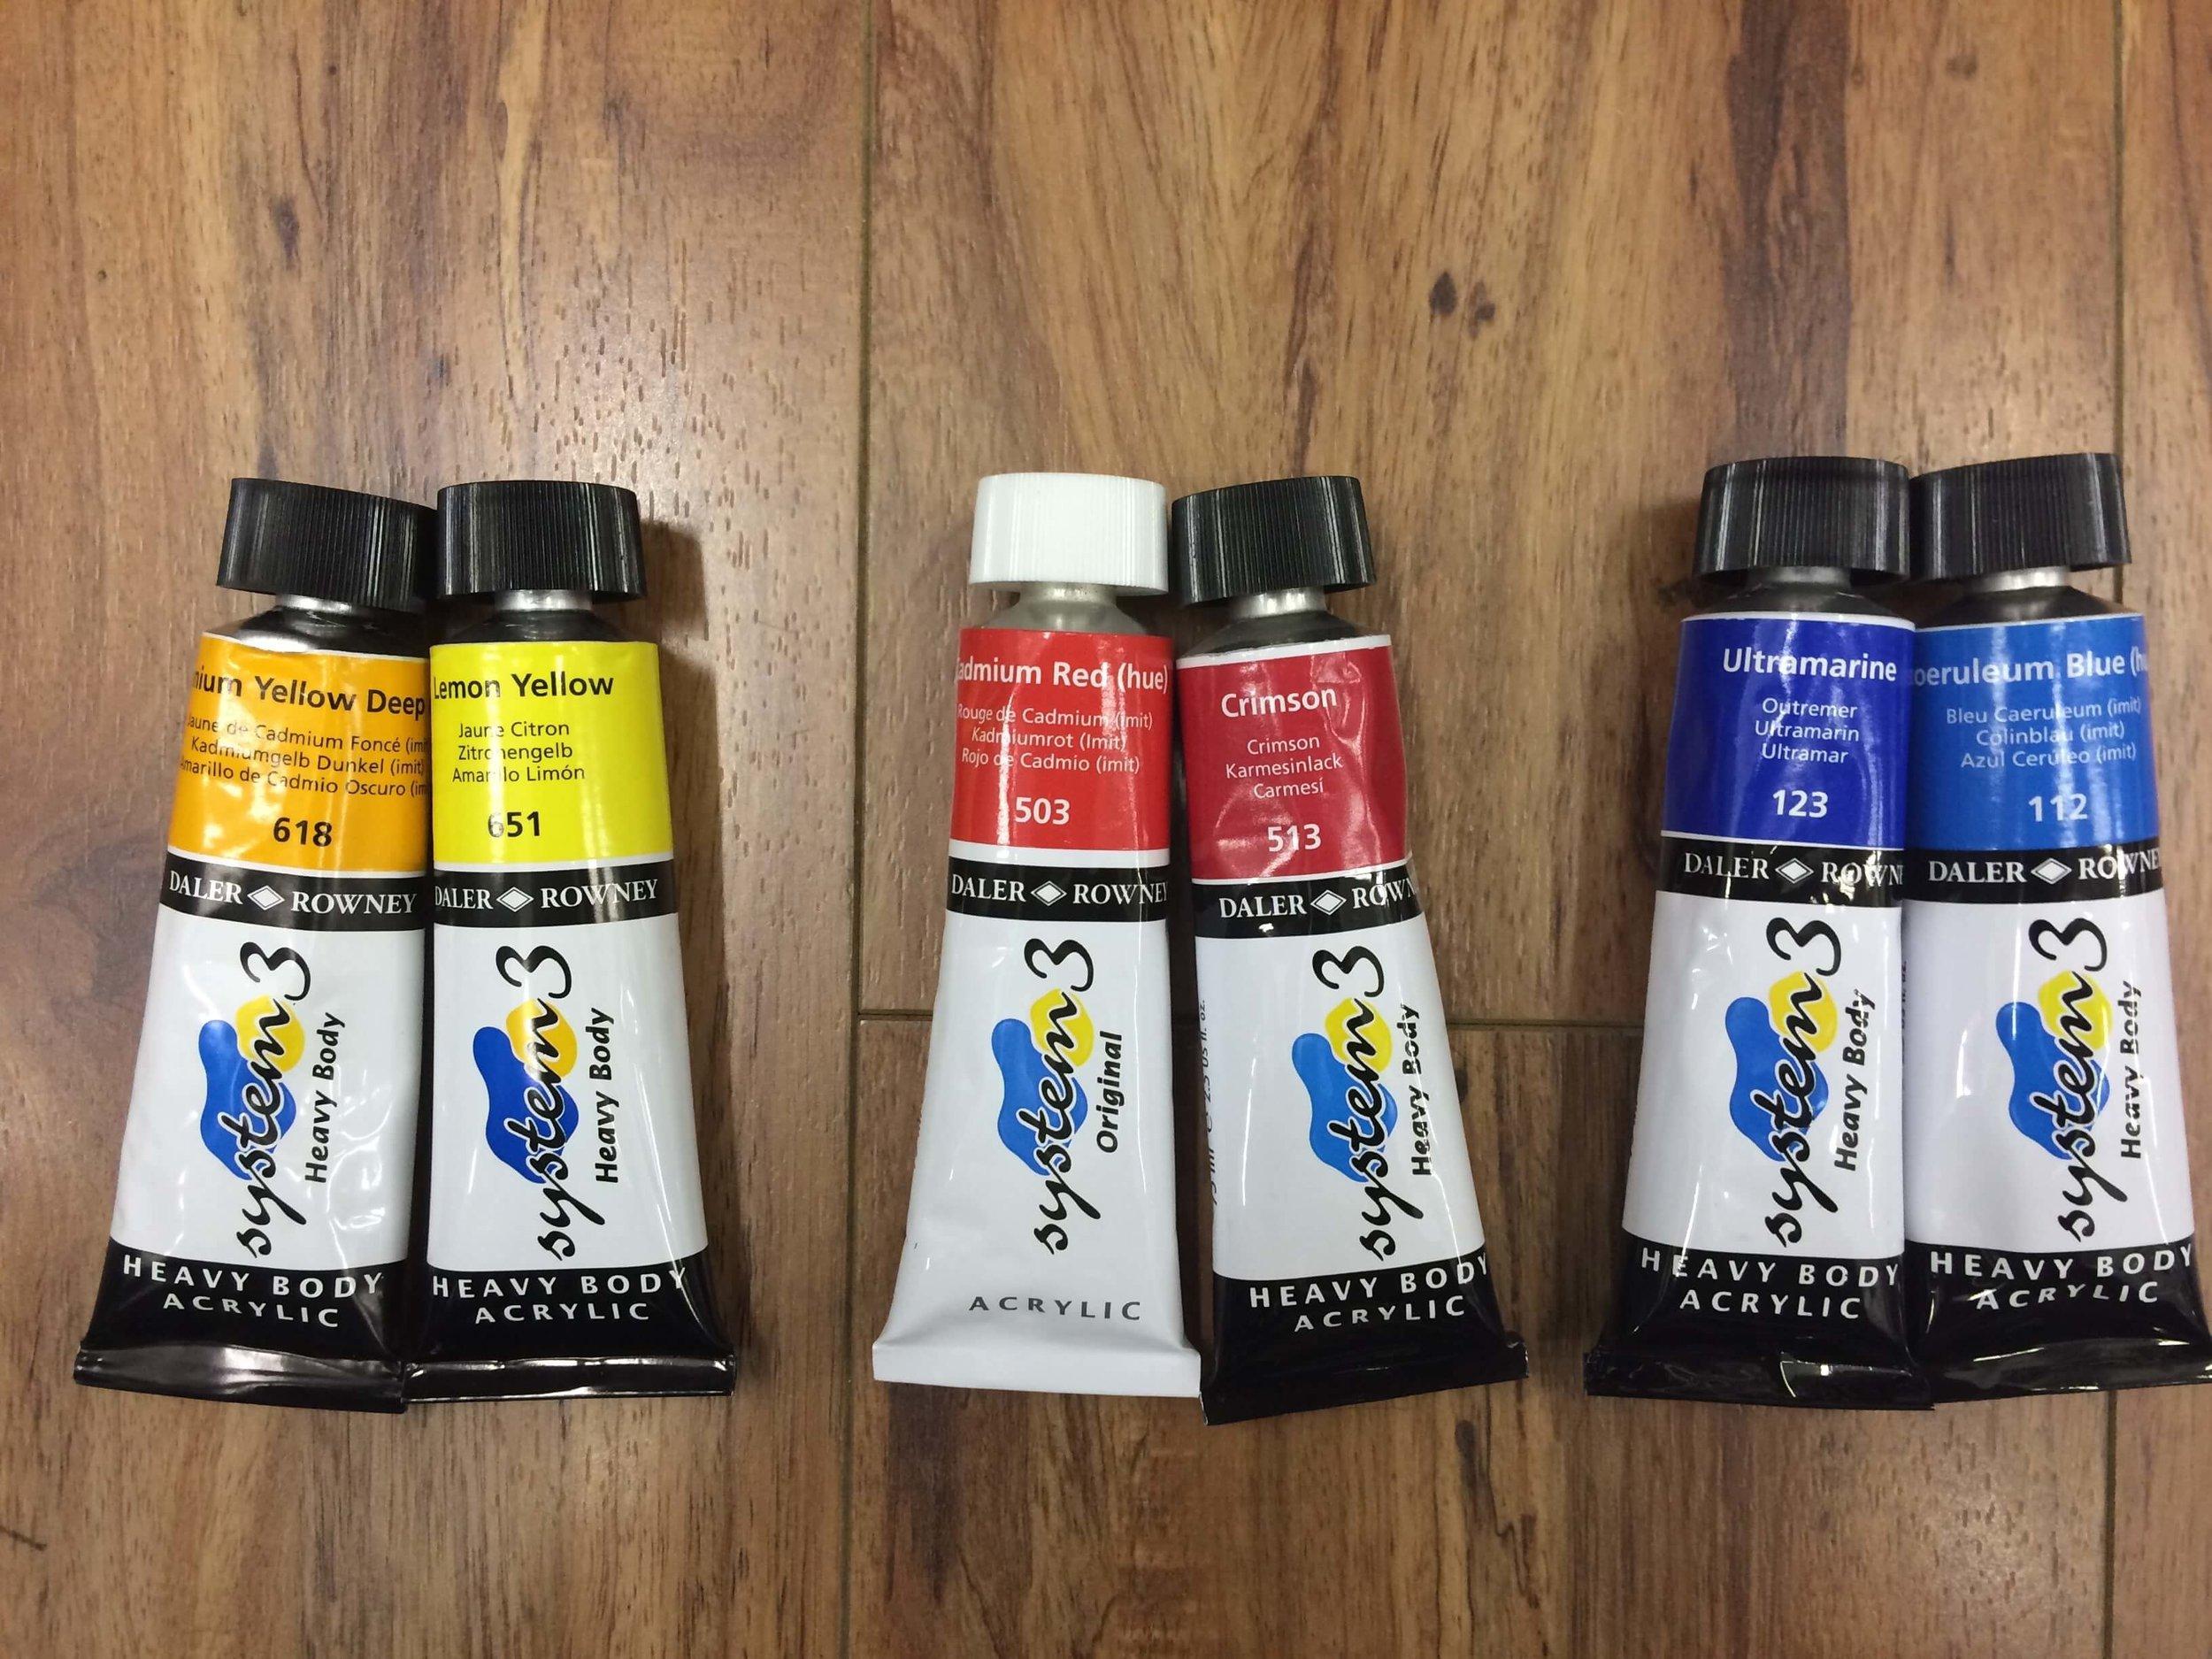 Daler Rowney   Heavy Body Acrylic : Cadmium Yellow Deep, Lemon Yellow, Cadmium Red (hue), Crimson, Ultramarine, Coeruleum Blue (hue).